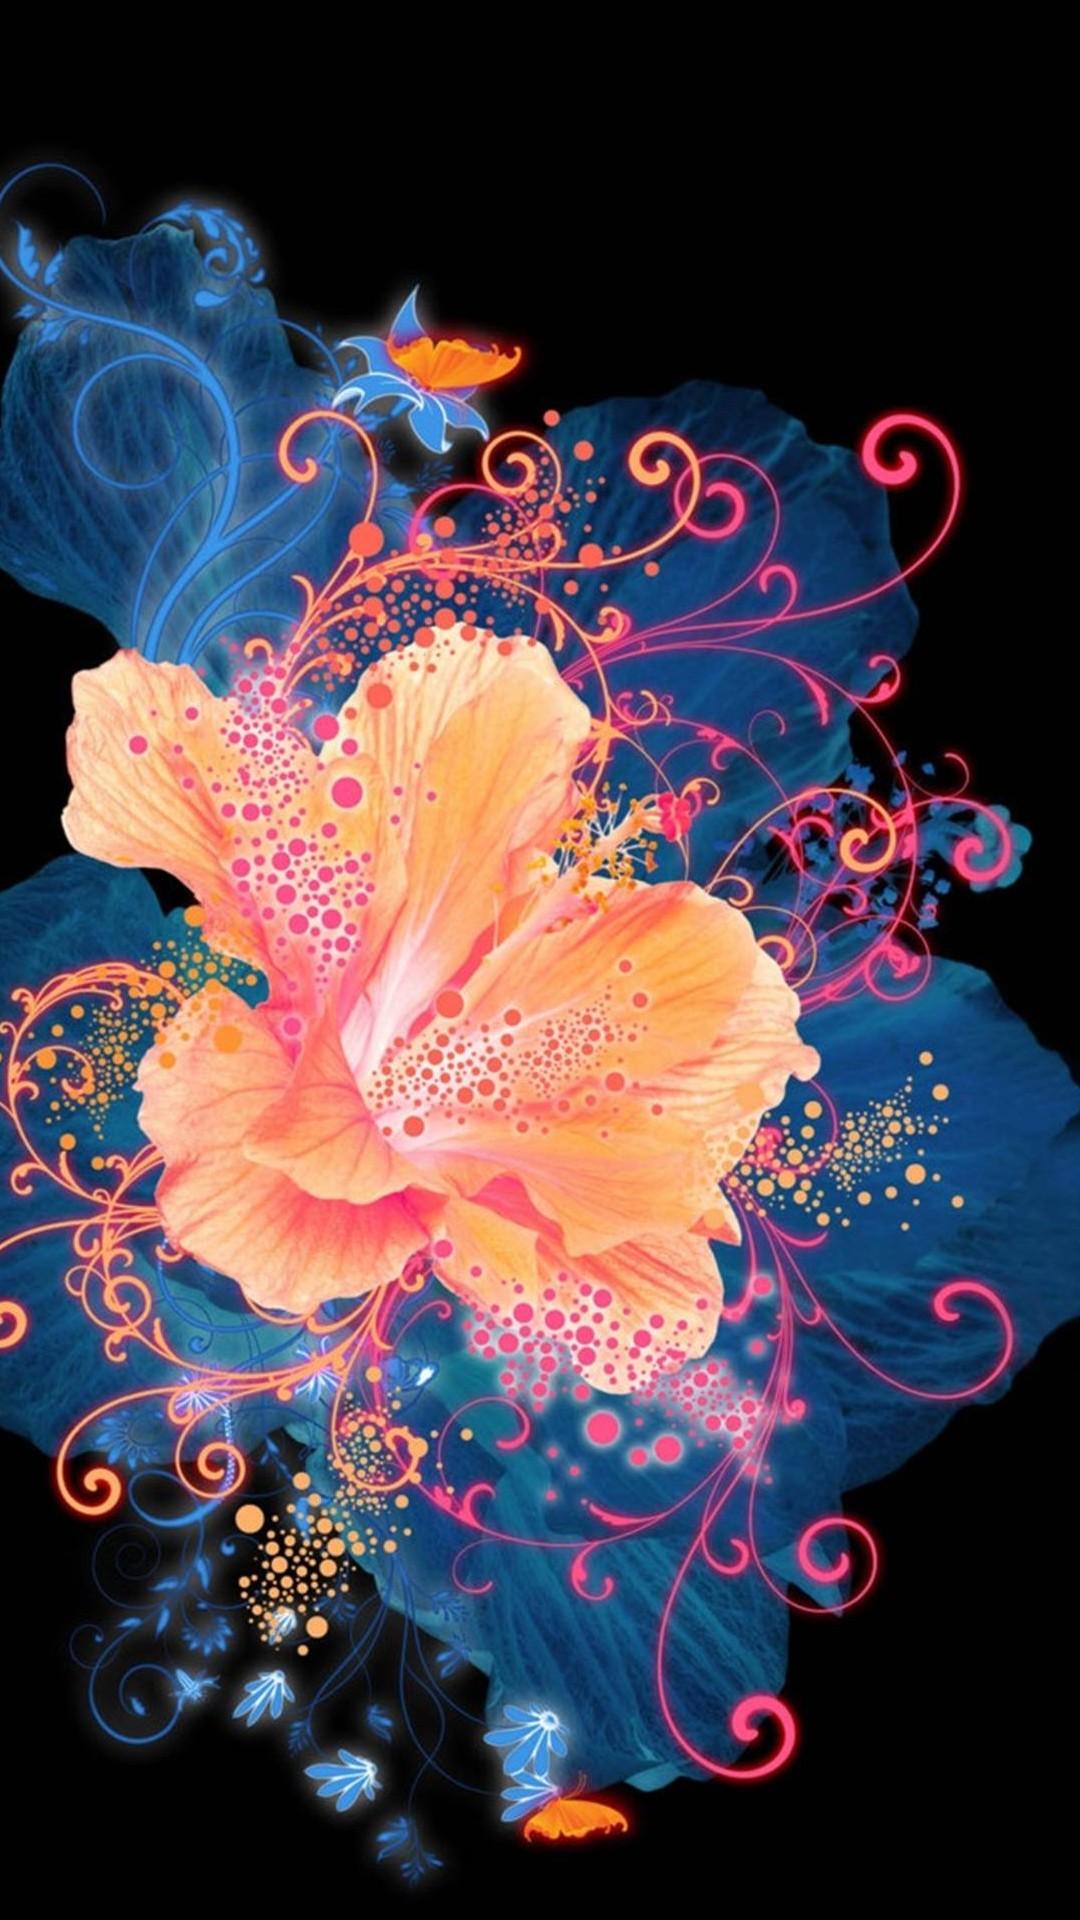 Colorful-Samsung-Galaxy-Note-wallpaper-wp5804671-1